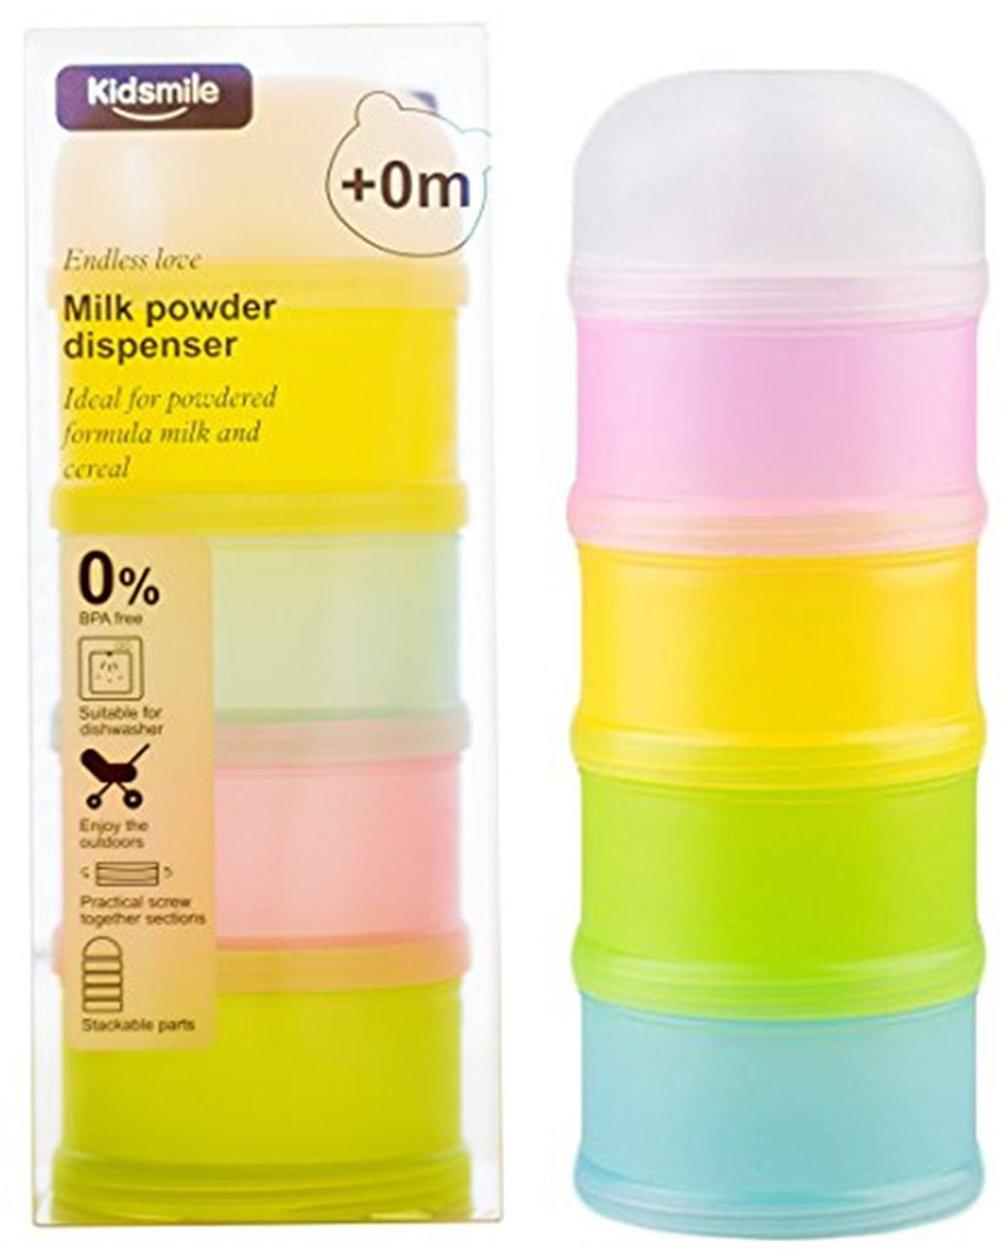 Kidsmile Baby Milk Powder Dispenser, Non Spill On The Go Twist Lock Dispenser, Food Containers